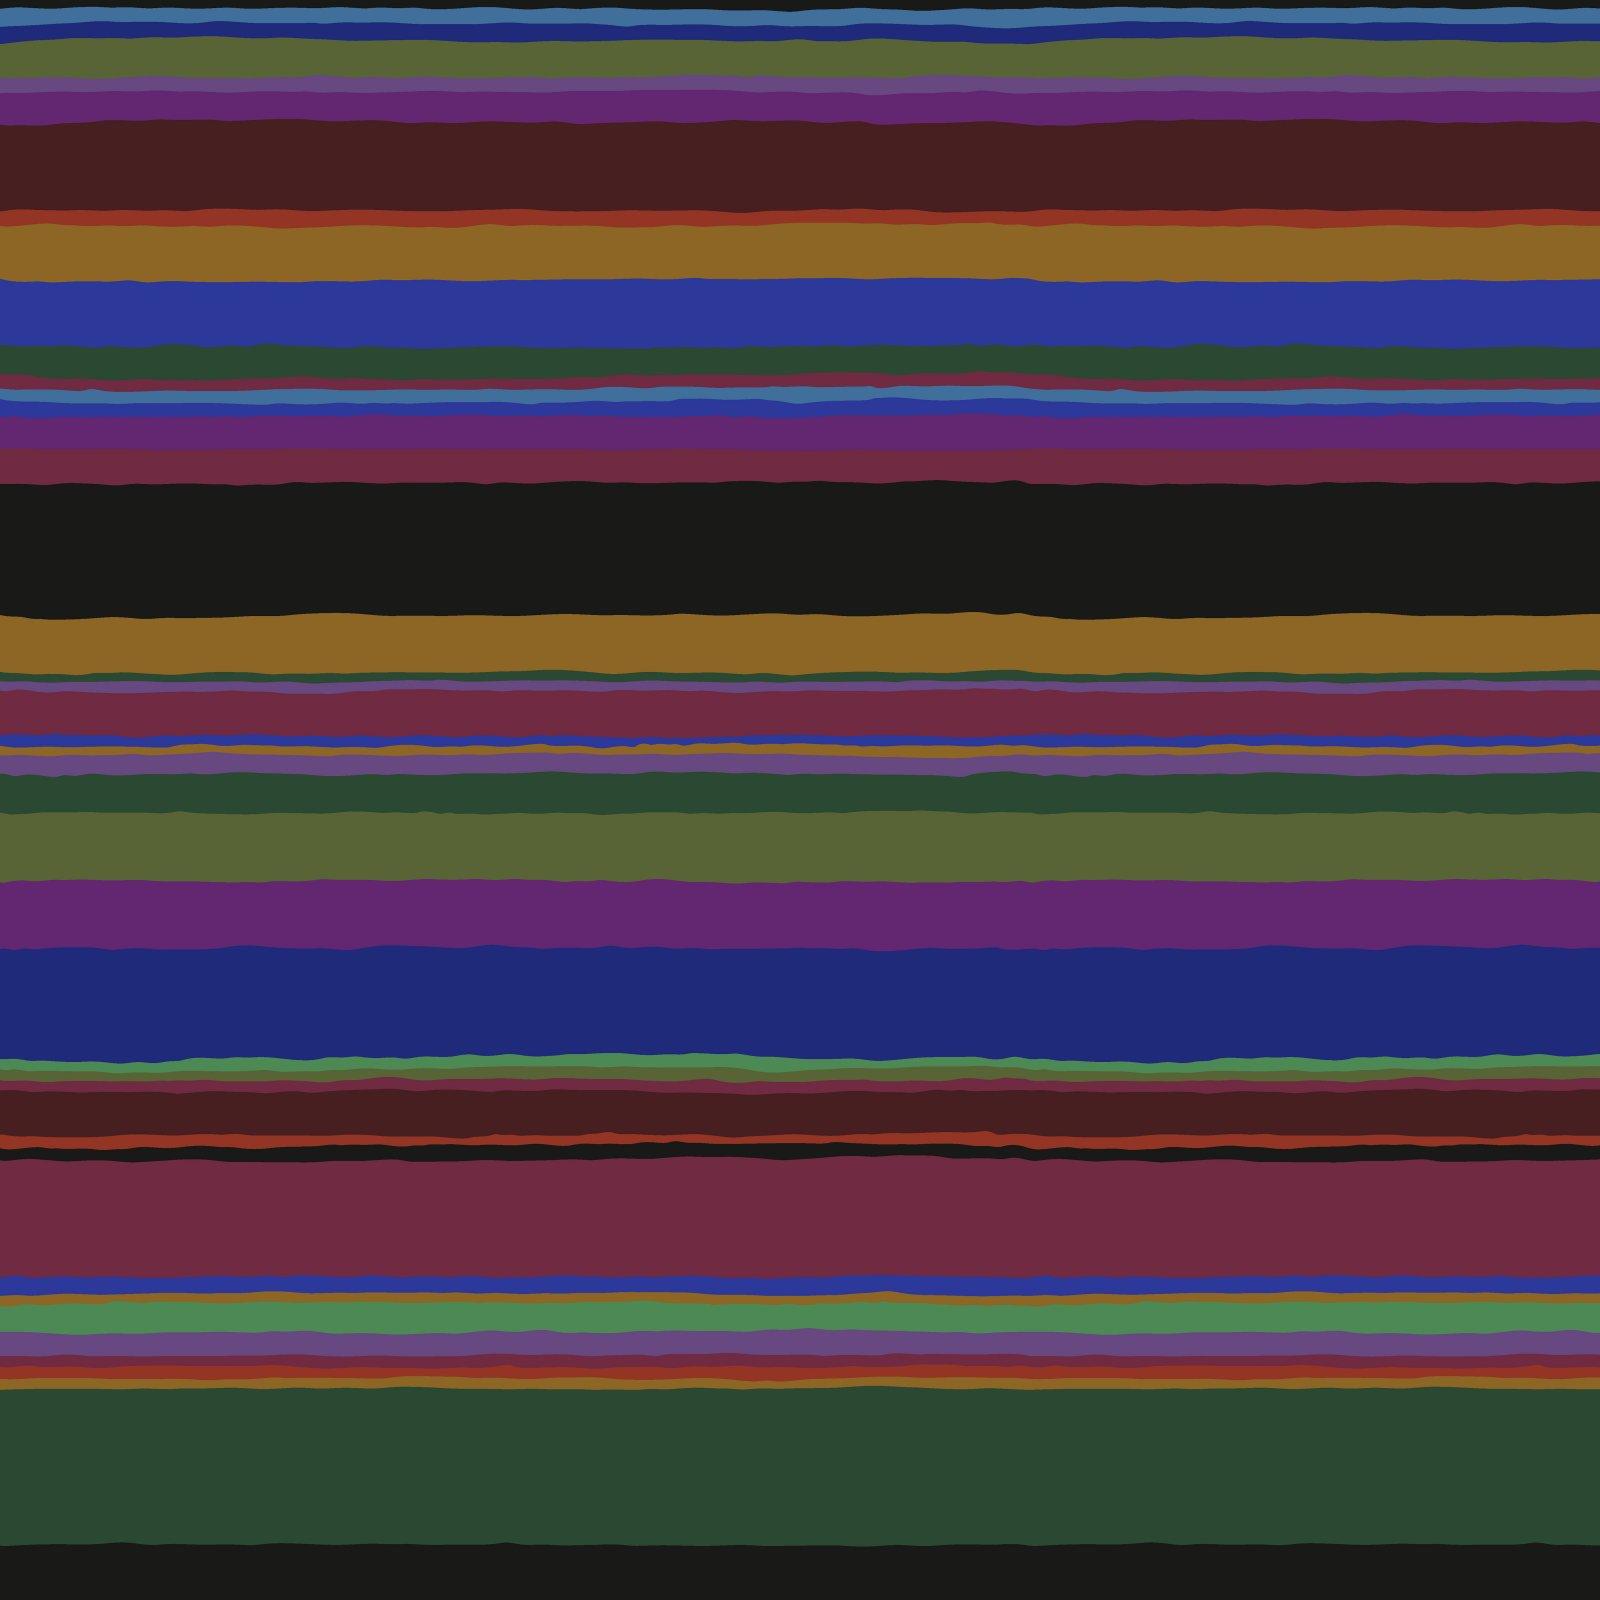 PWGP178.DARK Promenade Stripe - Dark